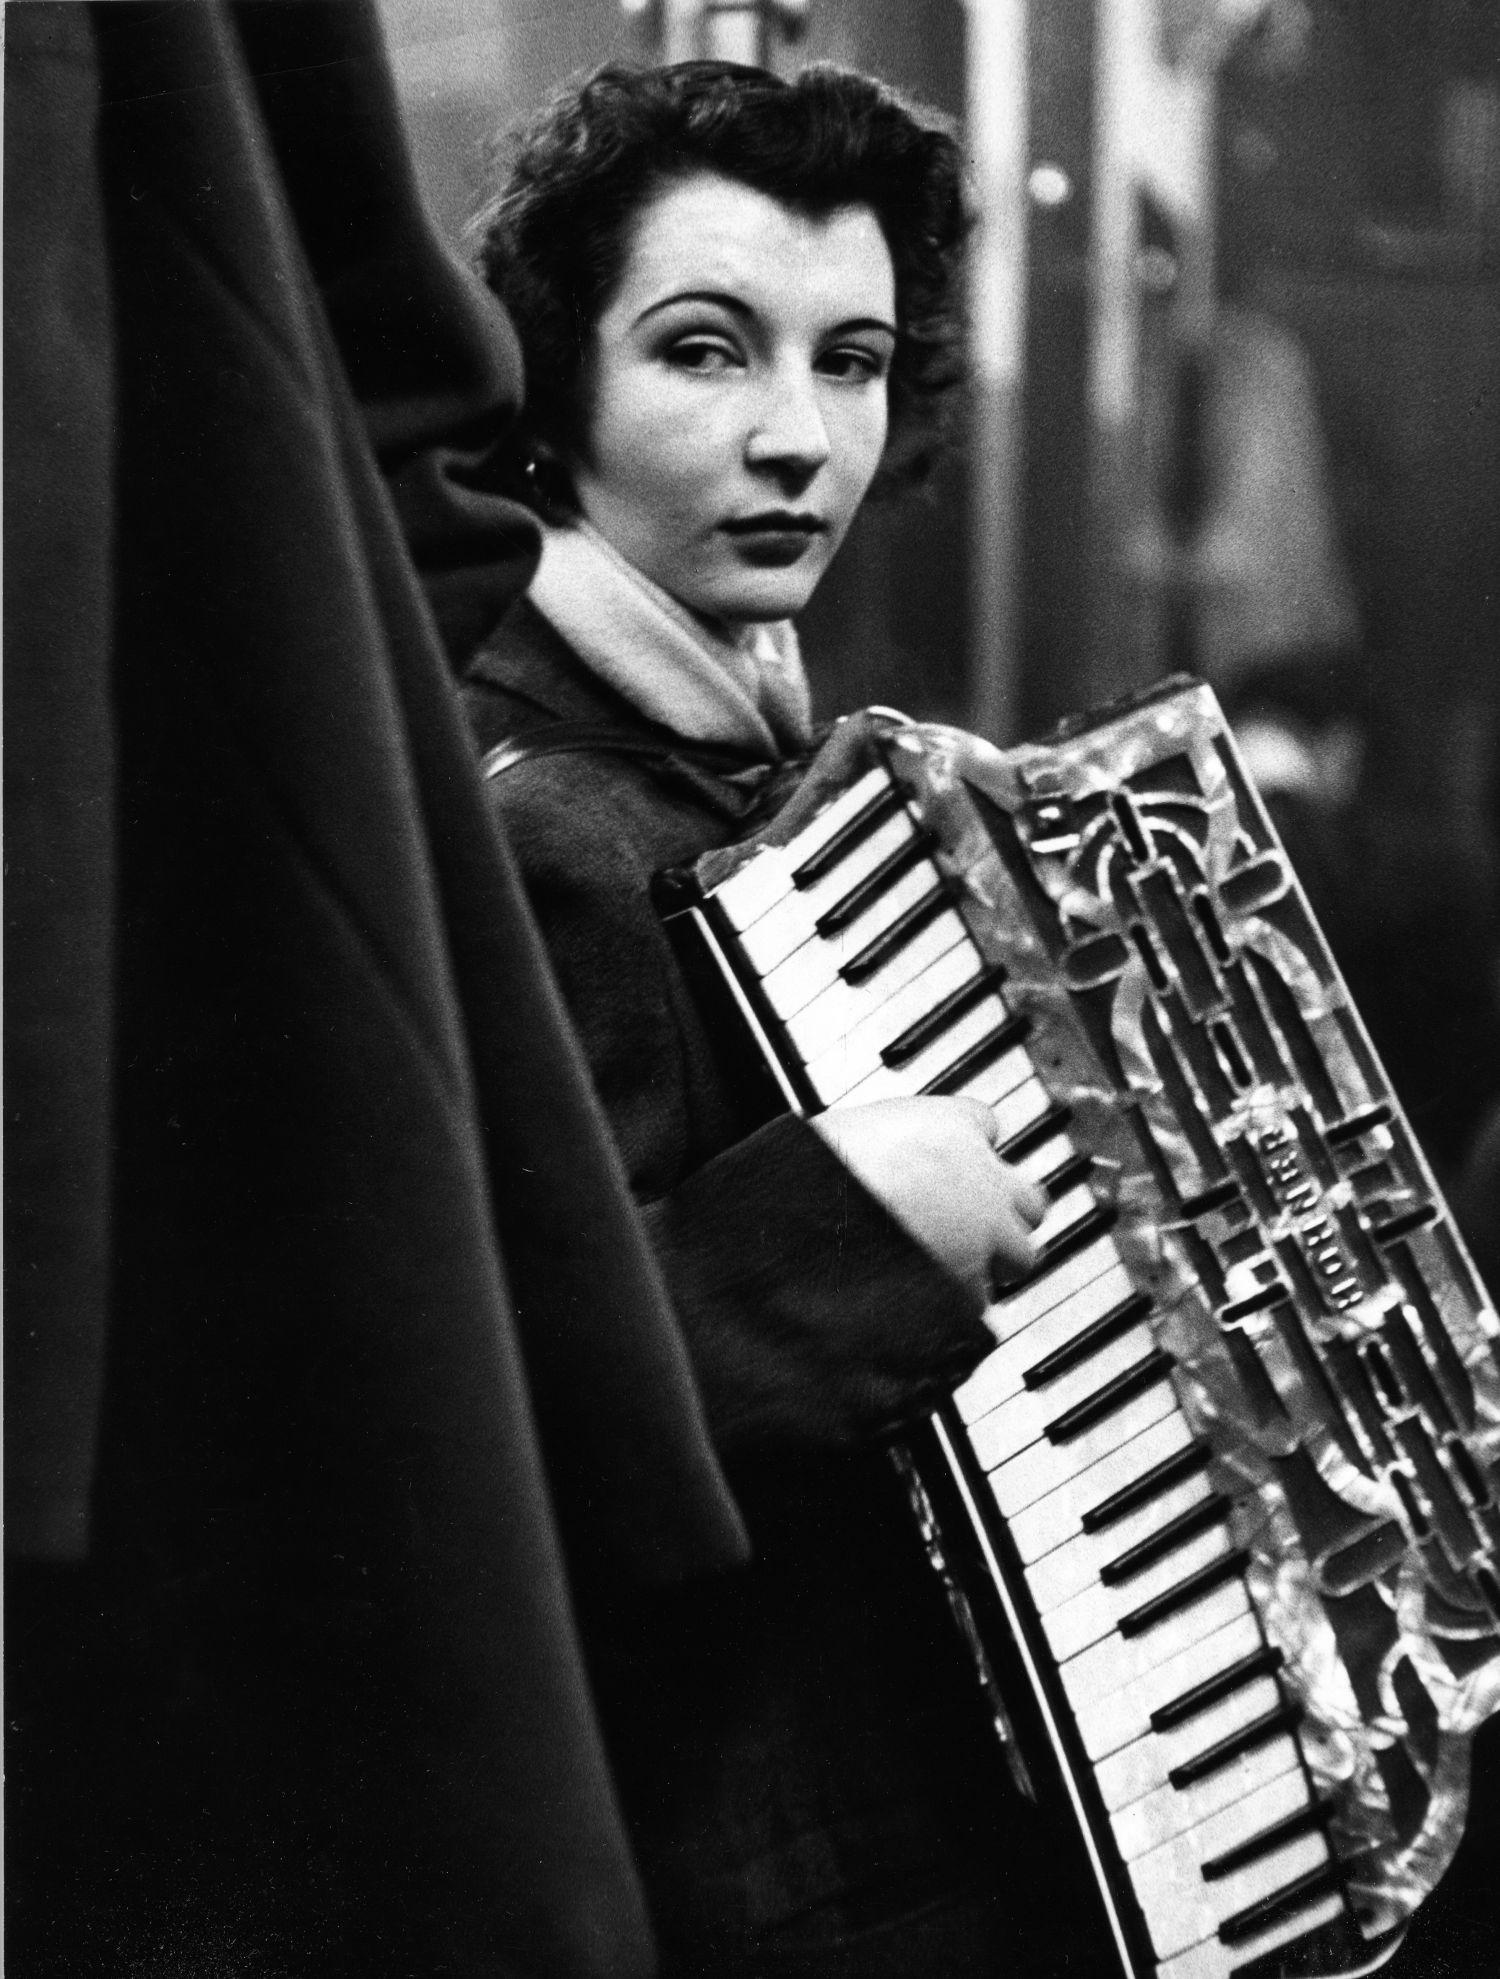 robert-doisneau-la-ballata-di-pierrette-dorient-1953-copyright-c2a9-atelier-robert-doisneau